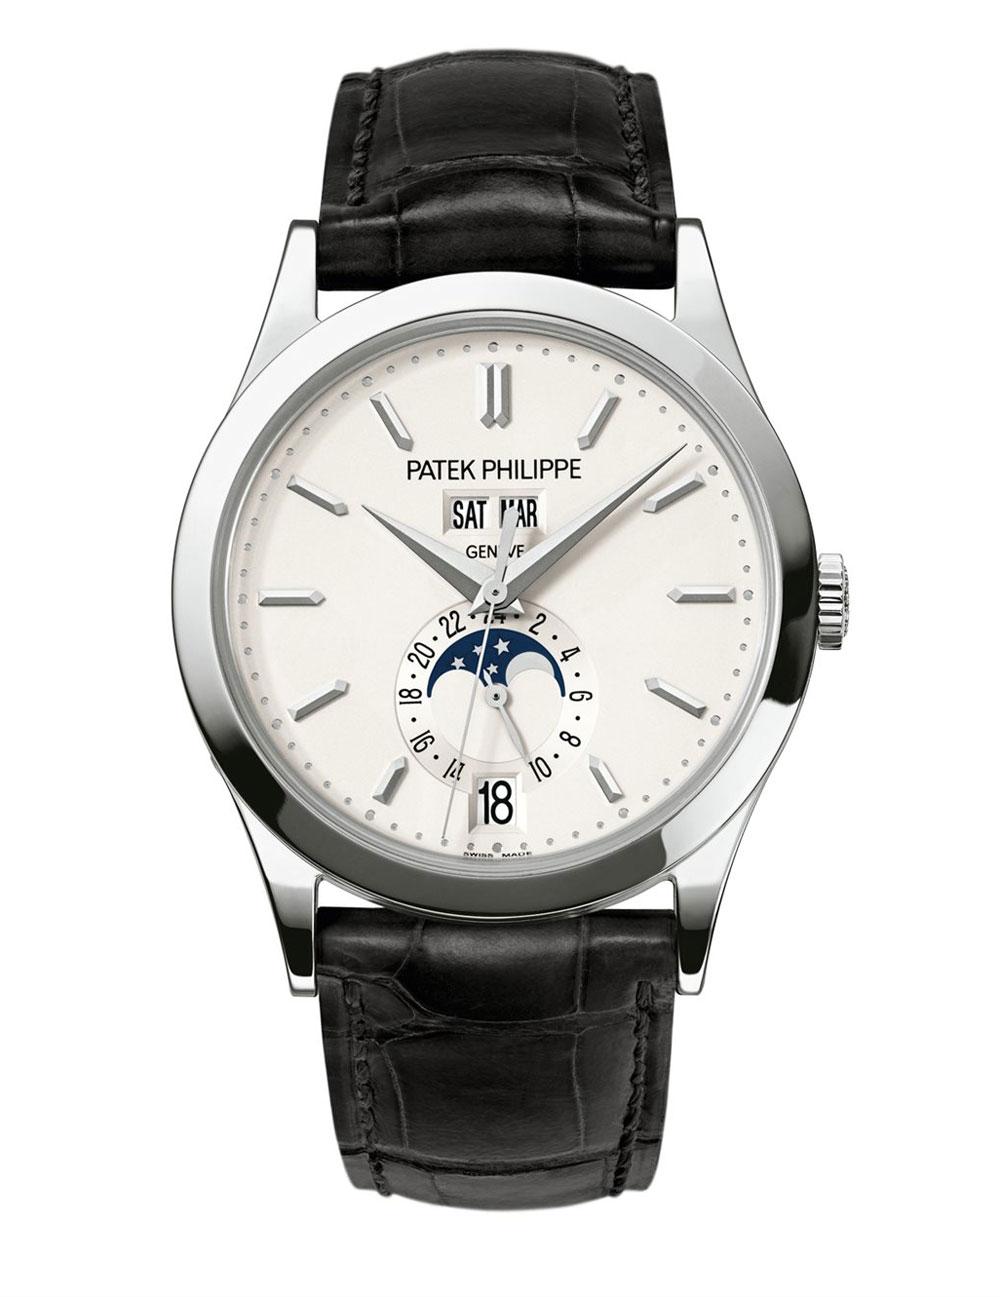 Reloj Patek Philippe Calendario Anual Fases lunares referencia 5396G